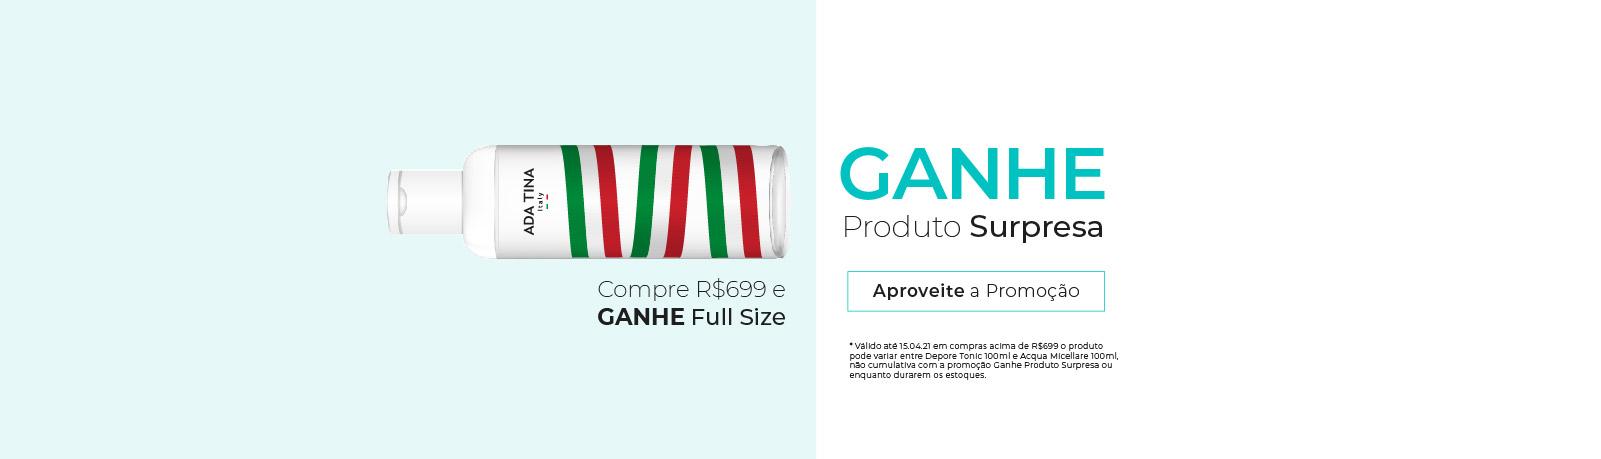 GANHE PRODUTO SUPRESA MOBILE